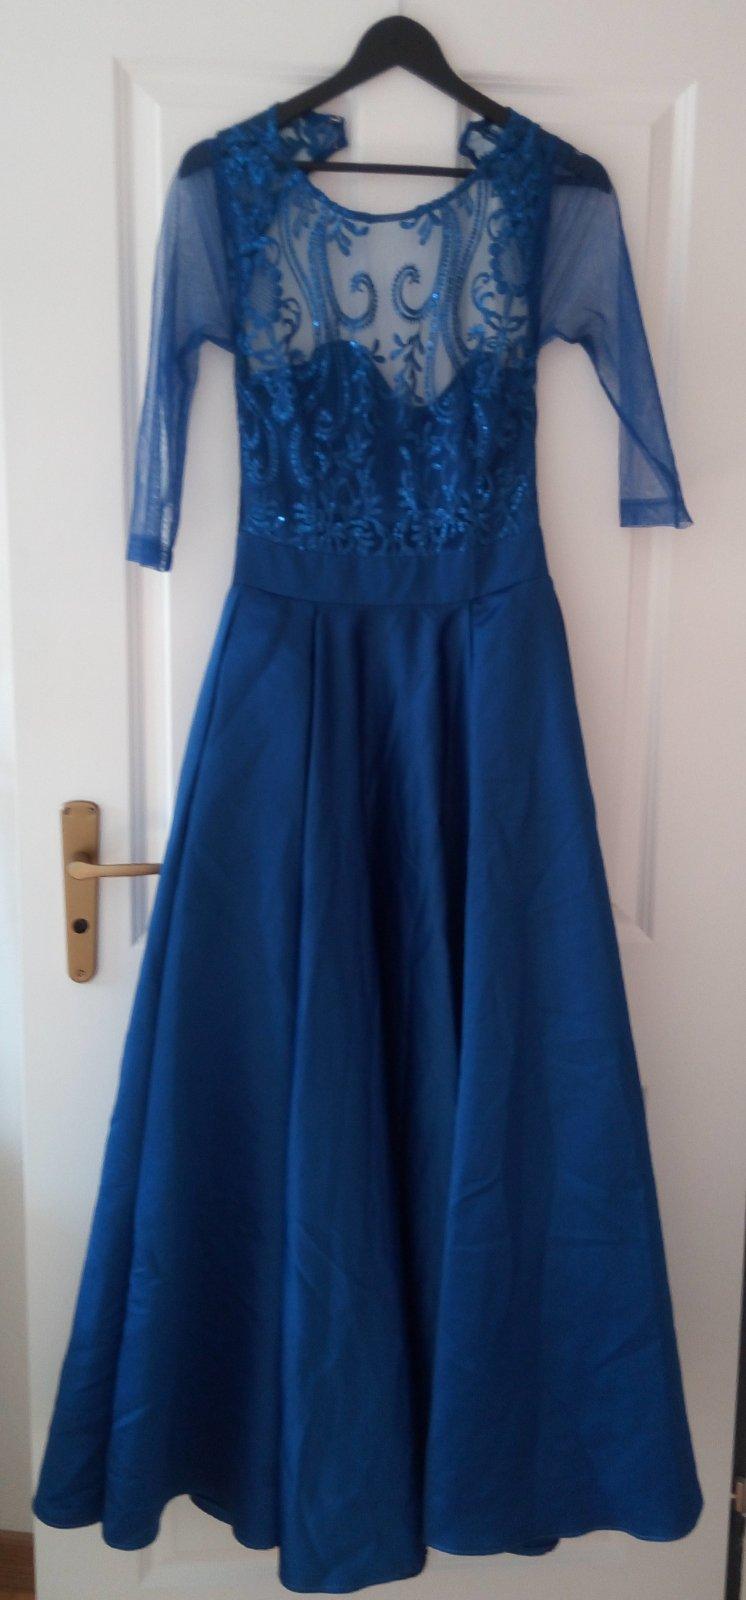 Dlhé kráľovsky modré spoločenské šaty XS - Obrázok č. 1